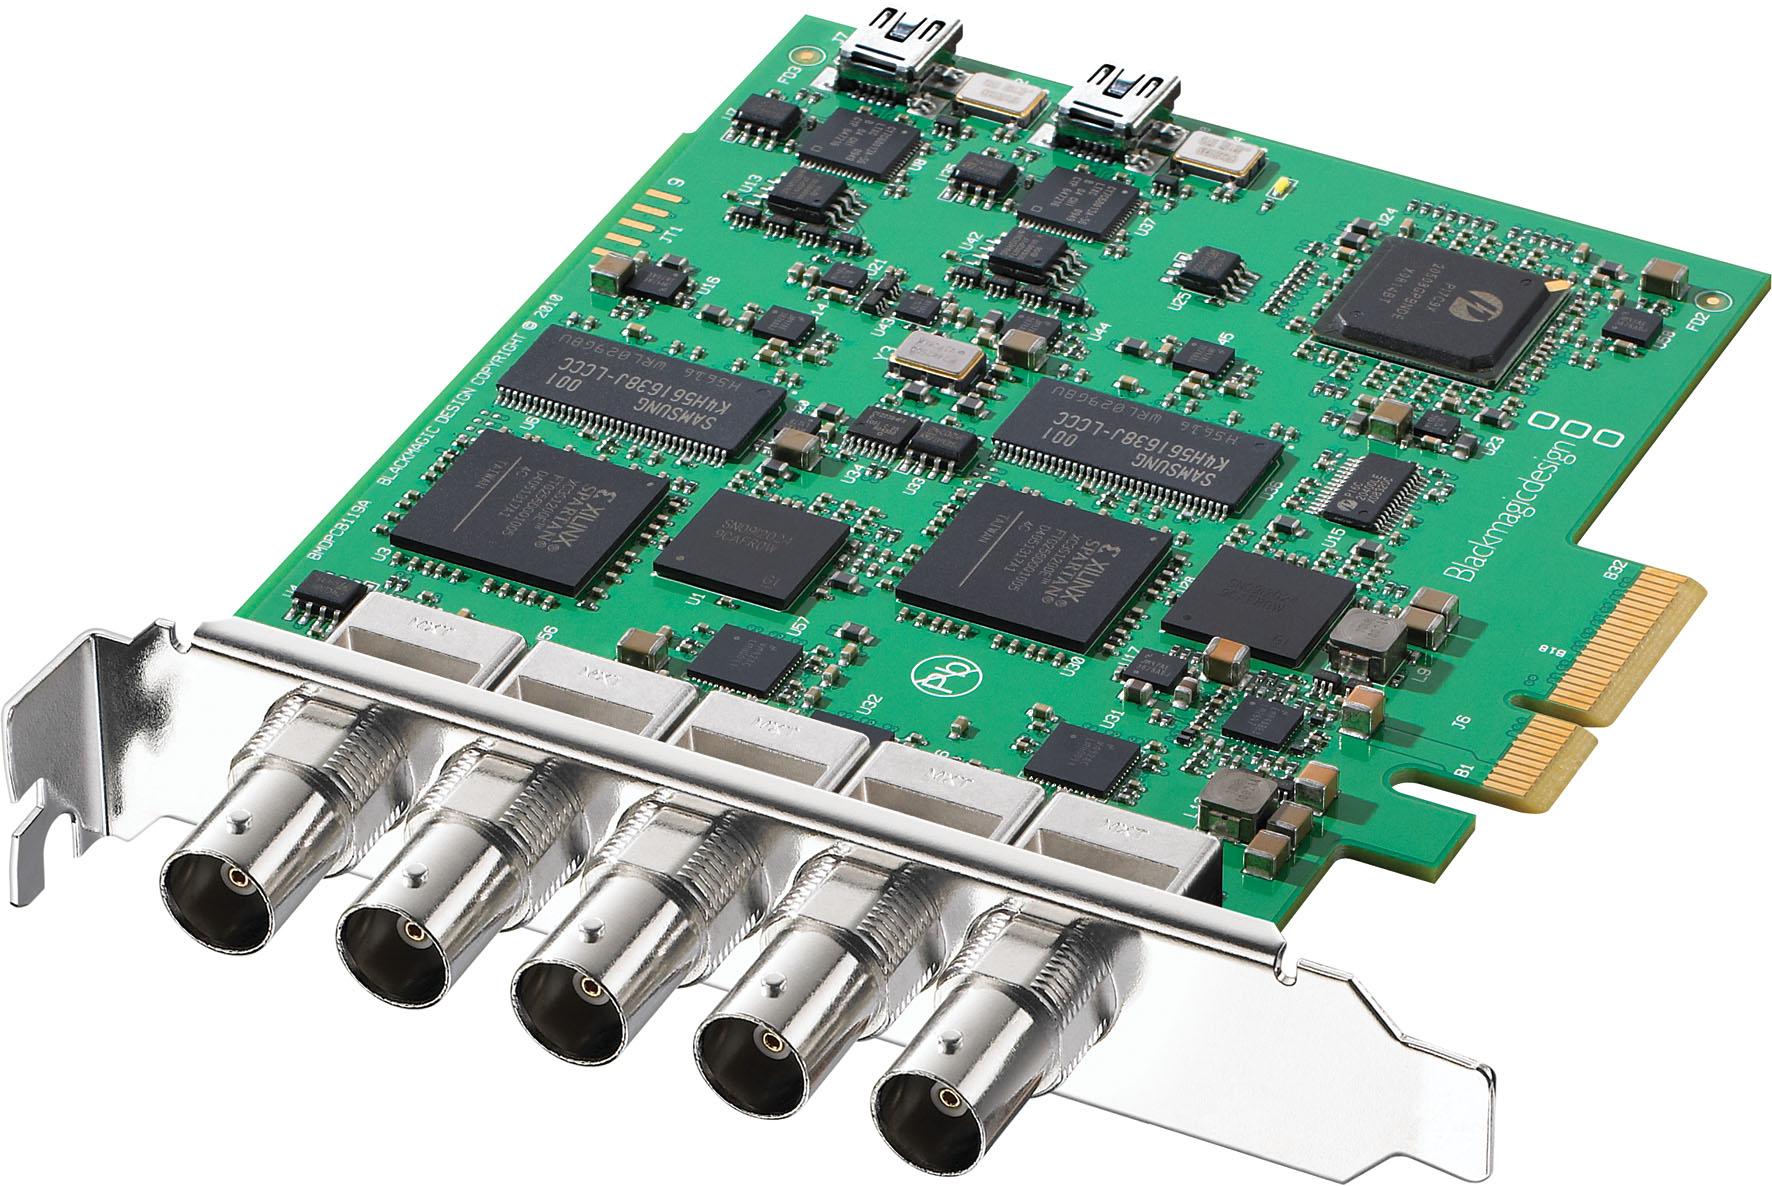 PCIe x4